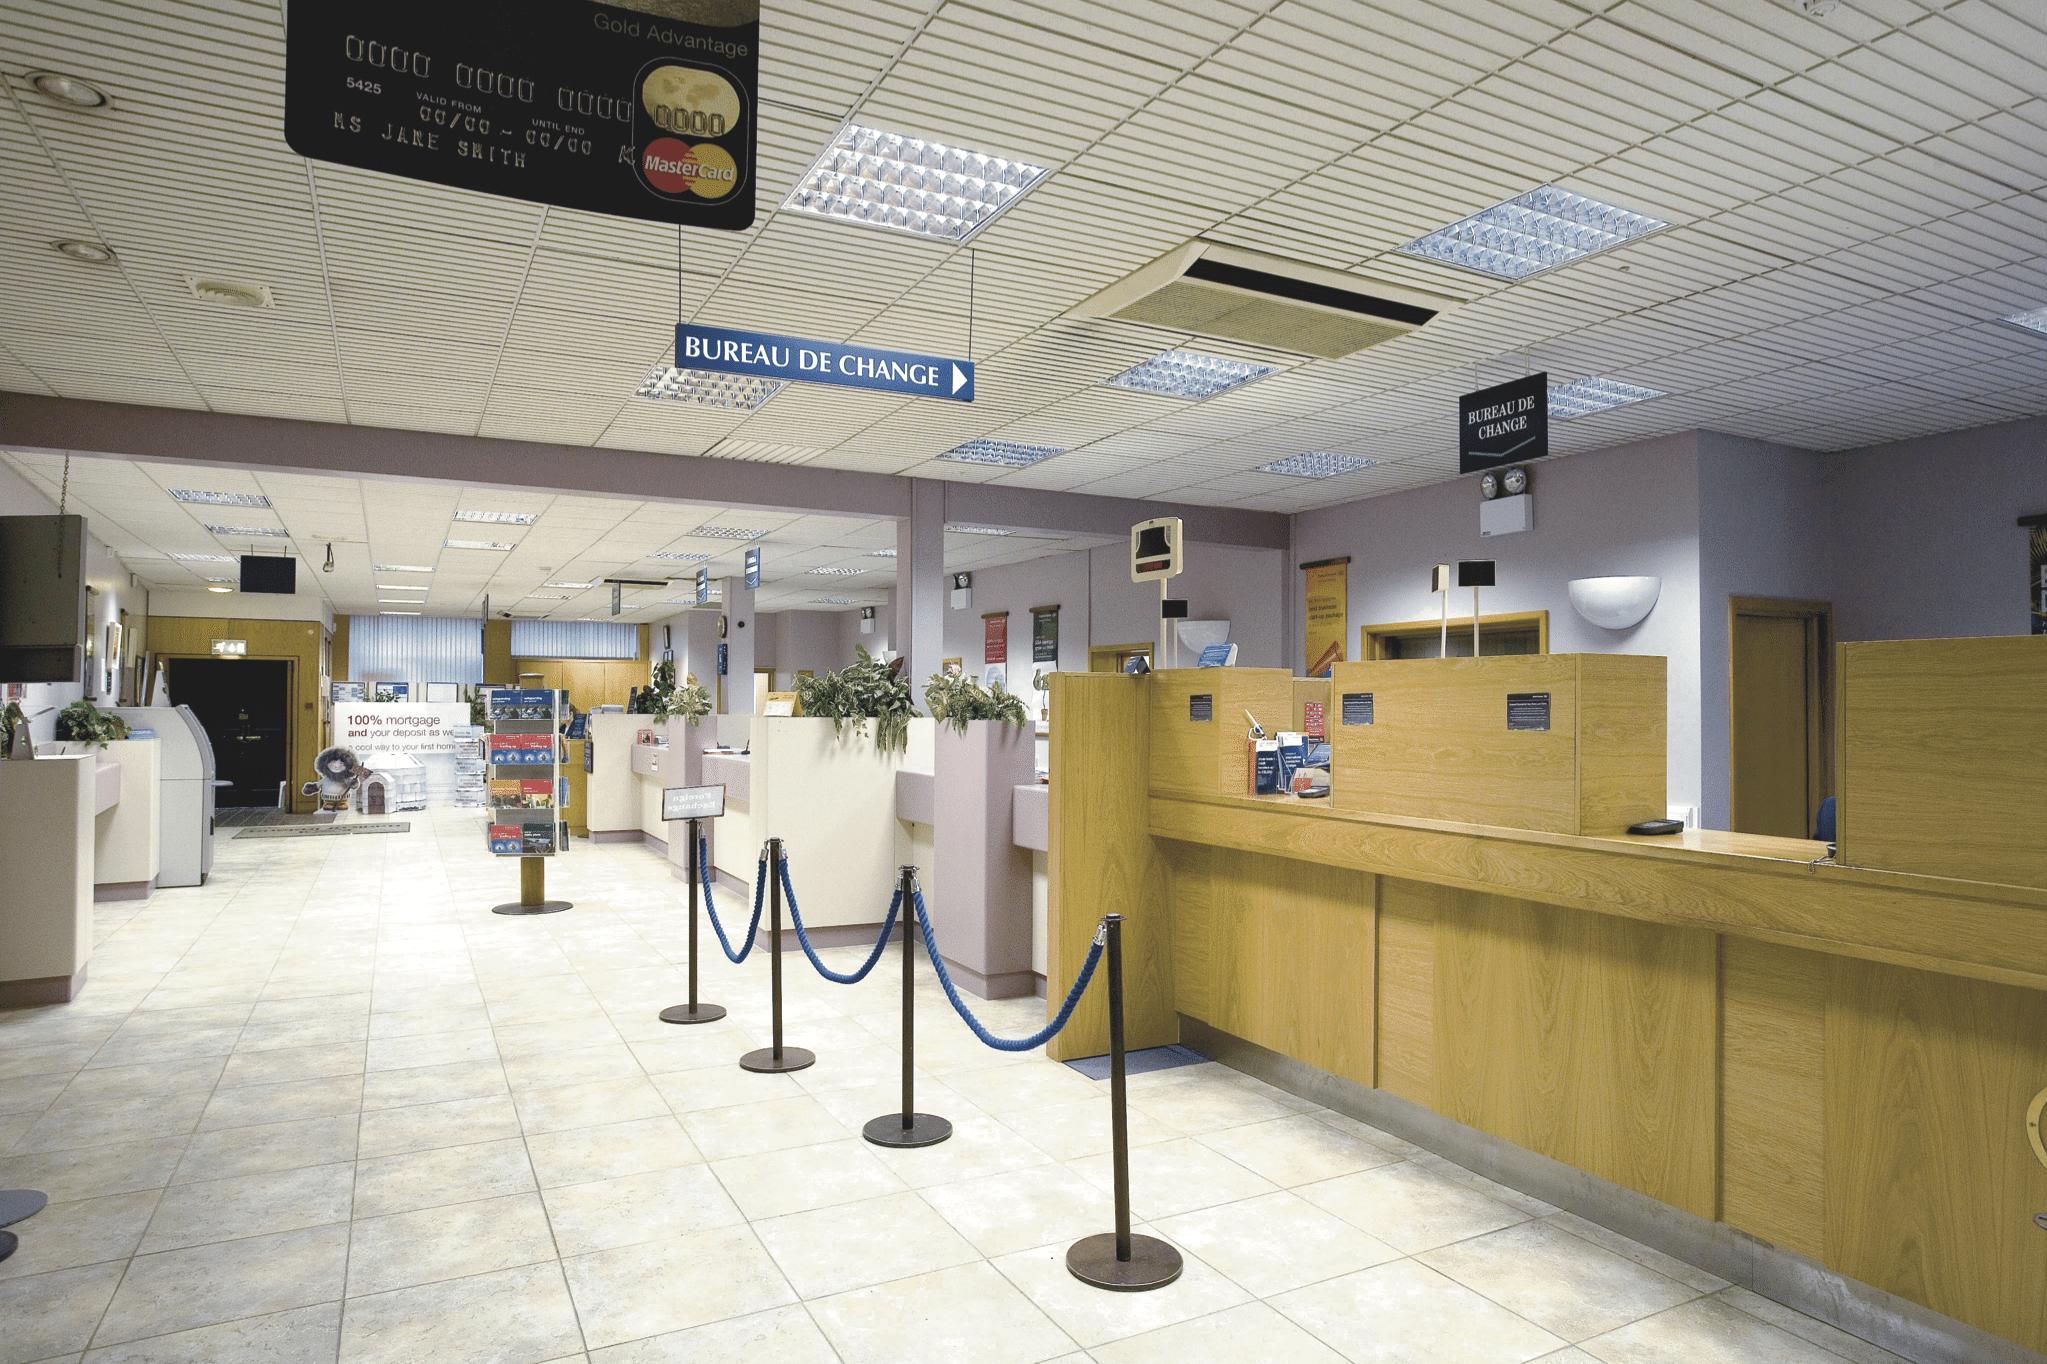 Loughrea Interior